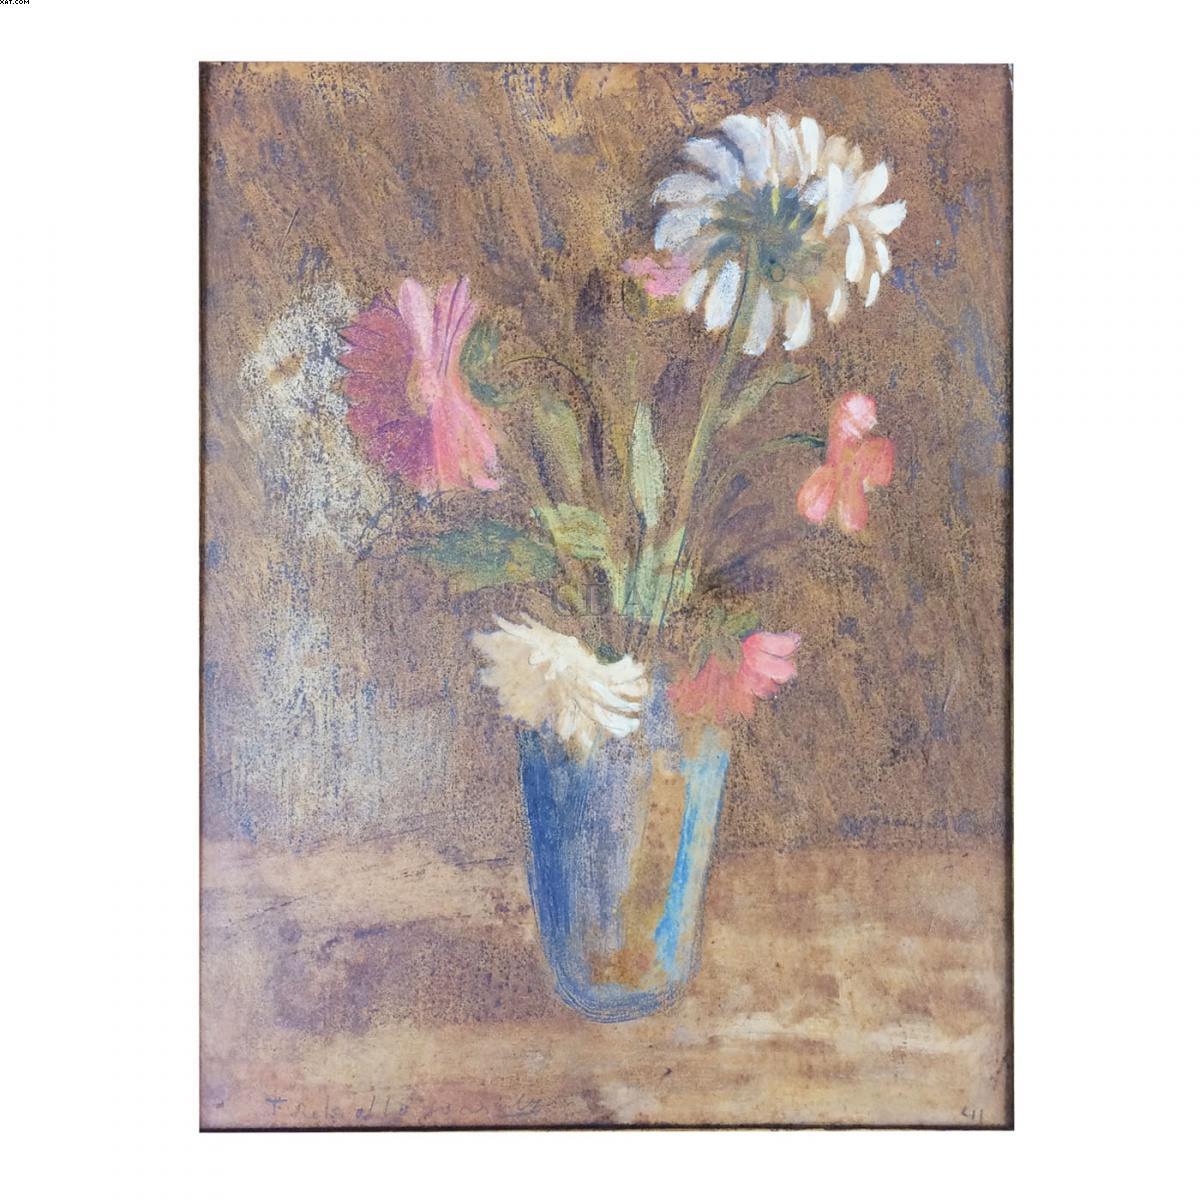 Flores - Francisco Rebolo Gonsales - Rebolo